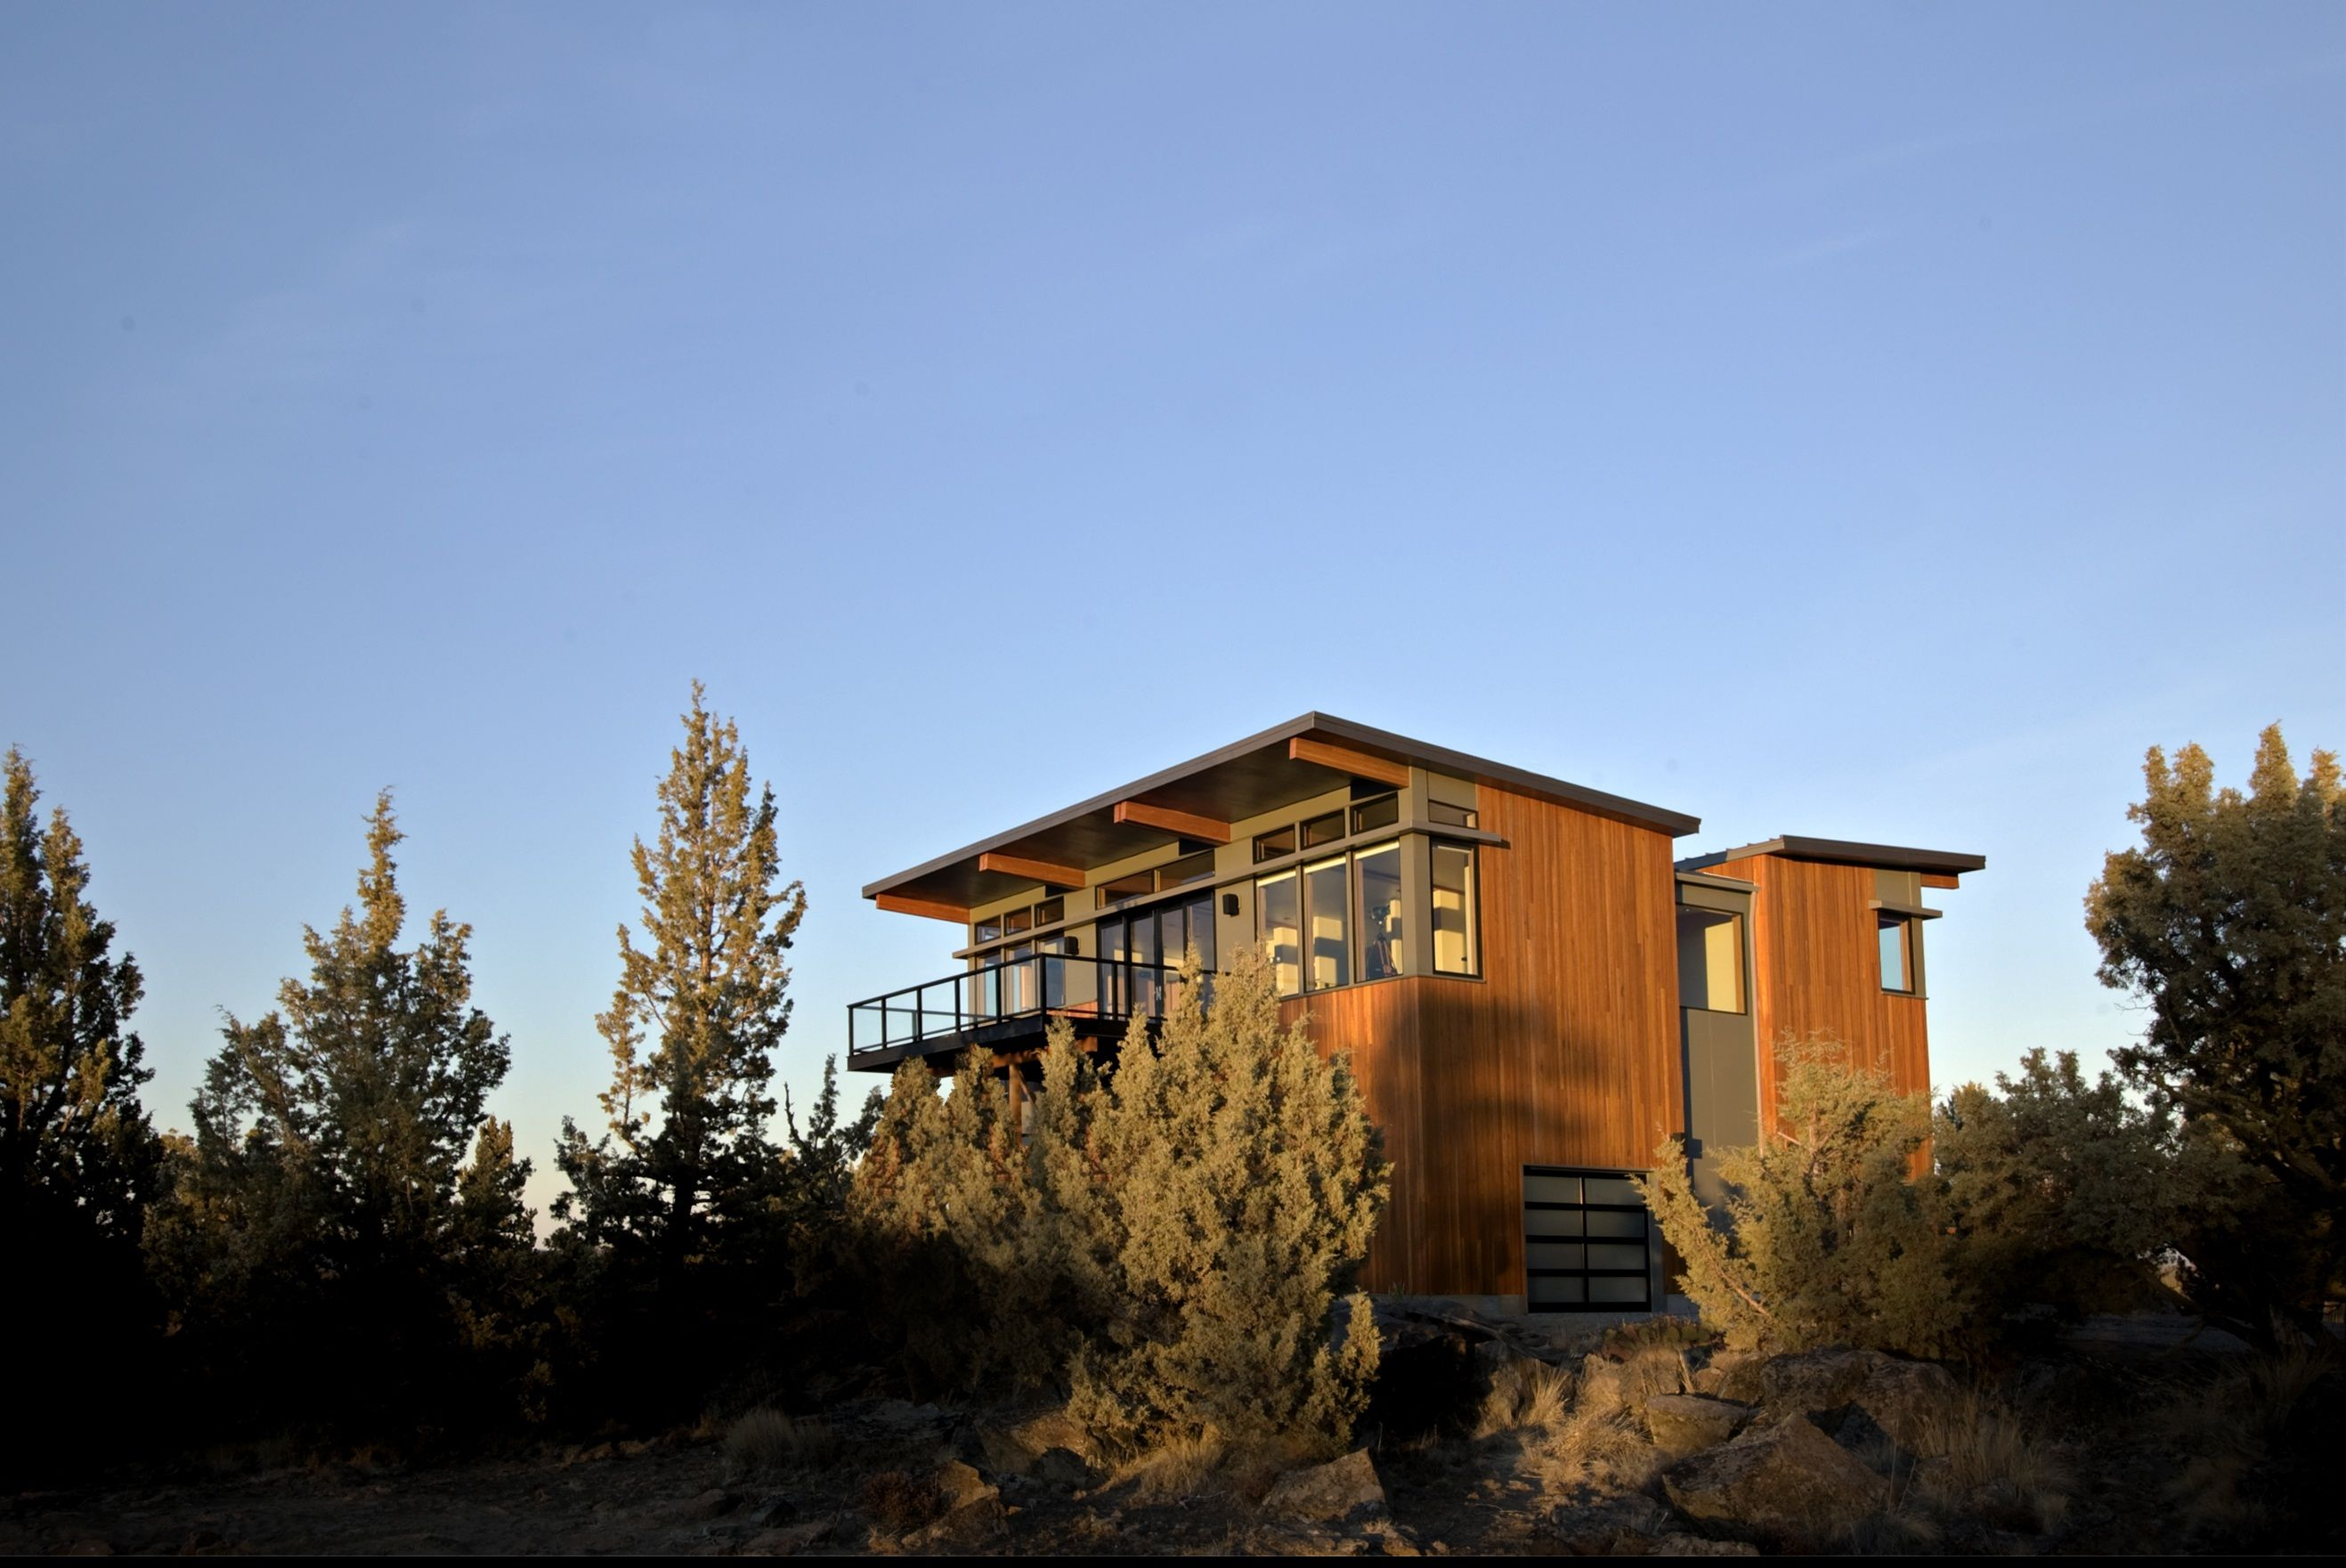 Modern Prefab Cabin Stillwater Dwellings Prefab Homes My Mid Century Furniture Is